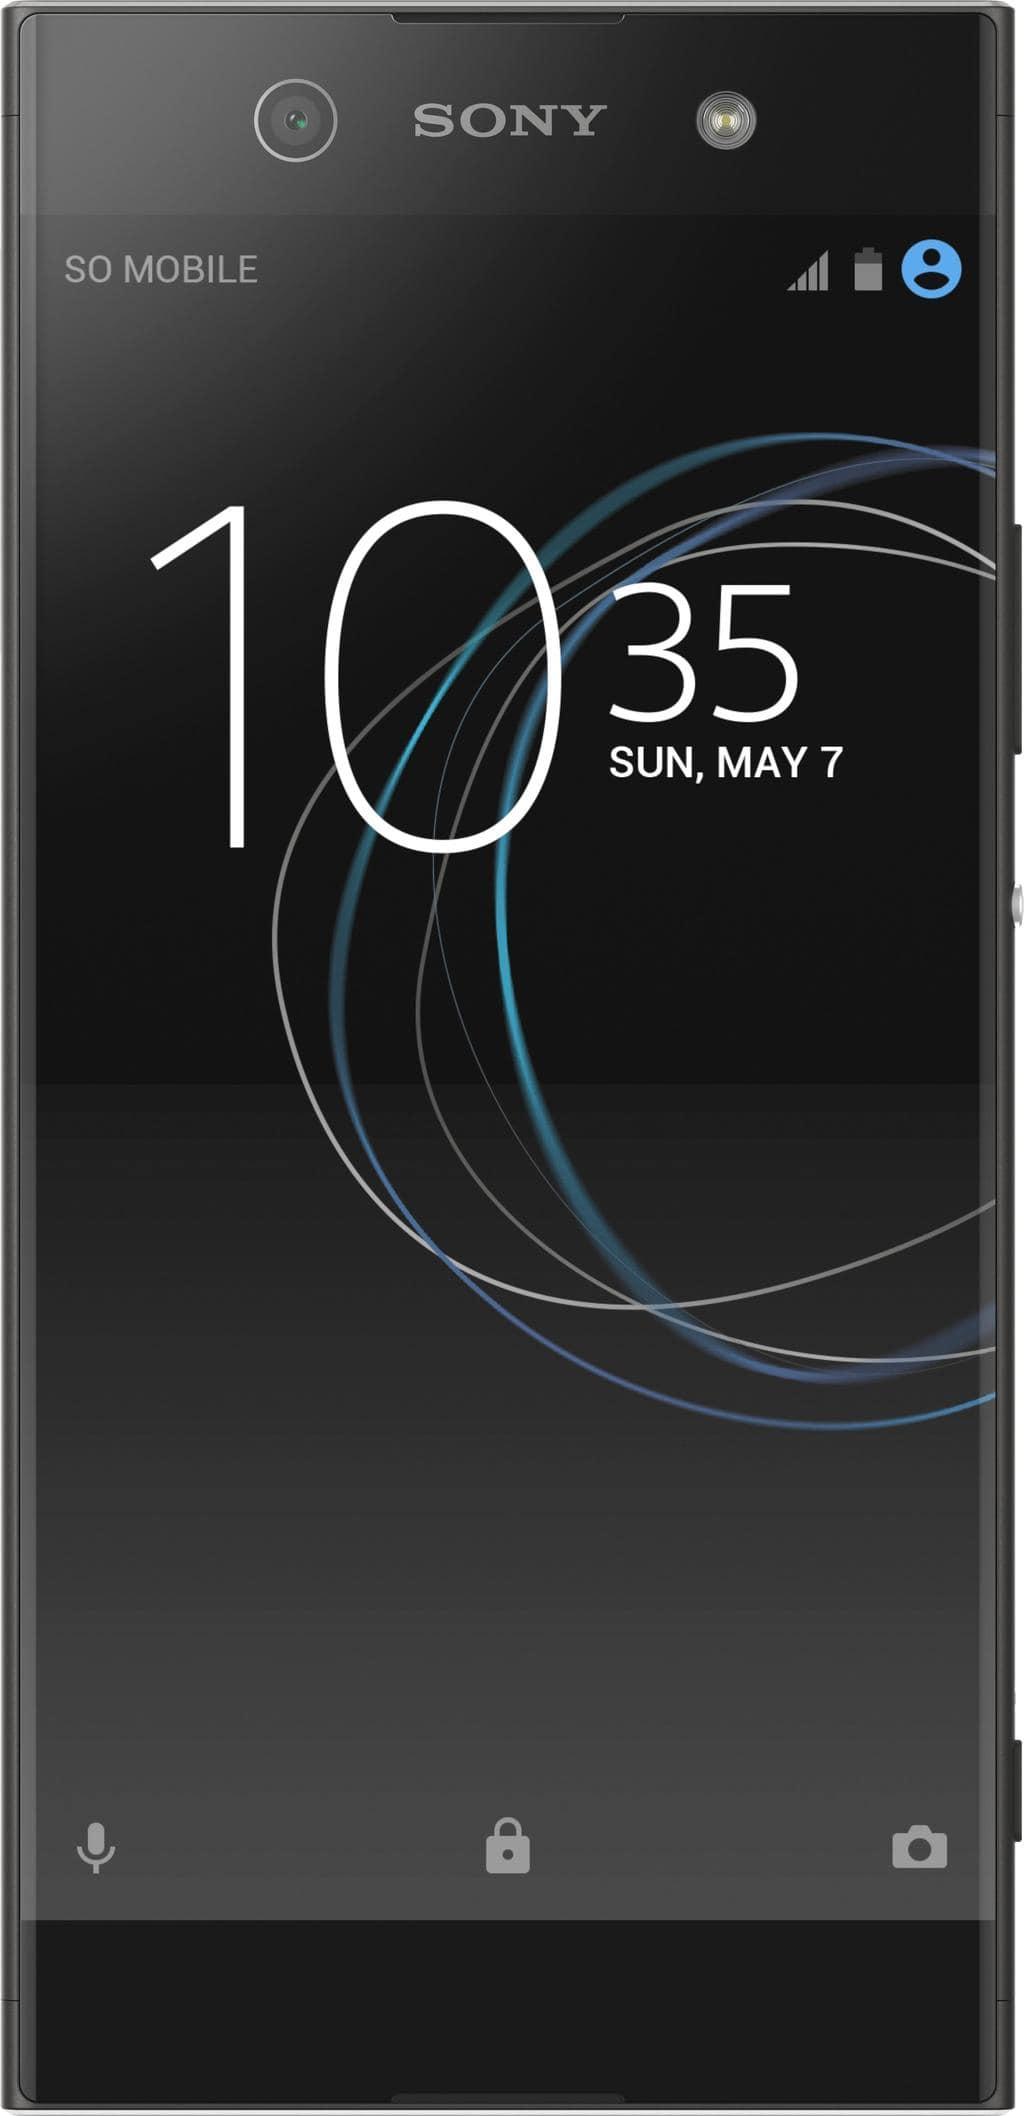 Sony Unlocked Mobile Phones At Best Buy